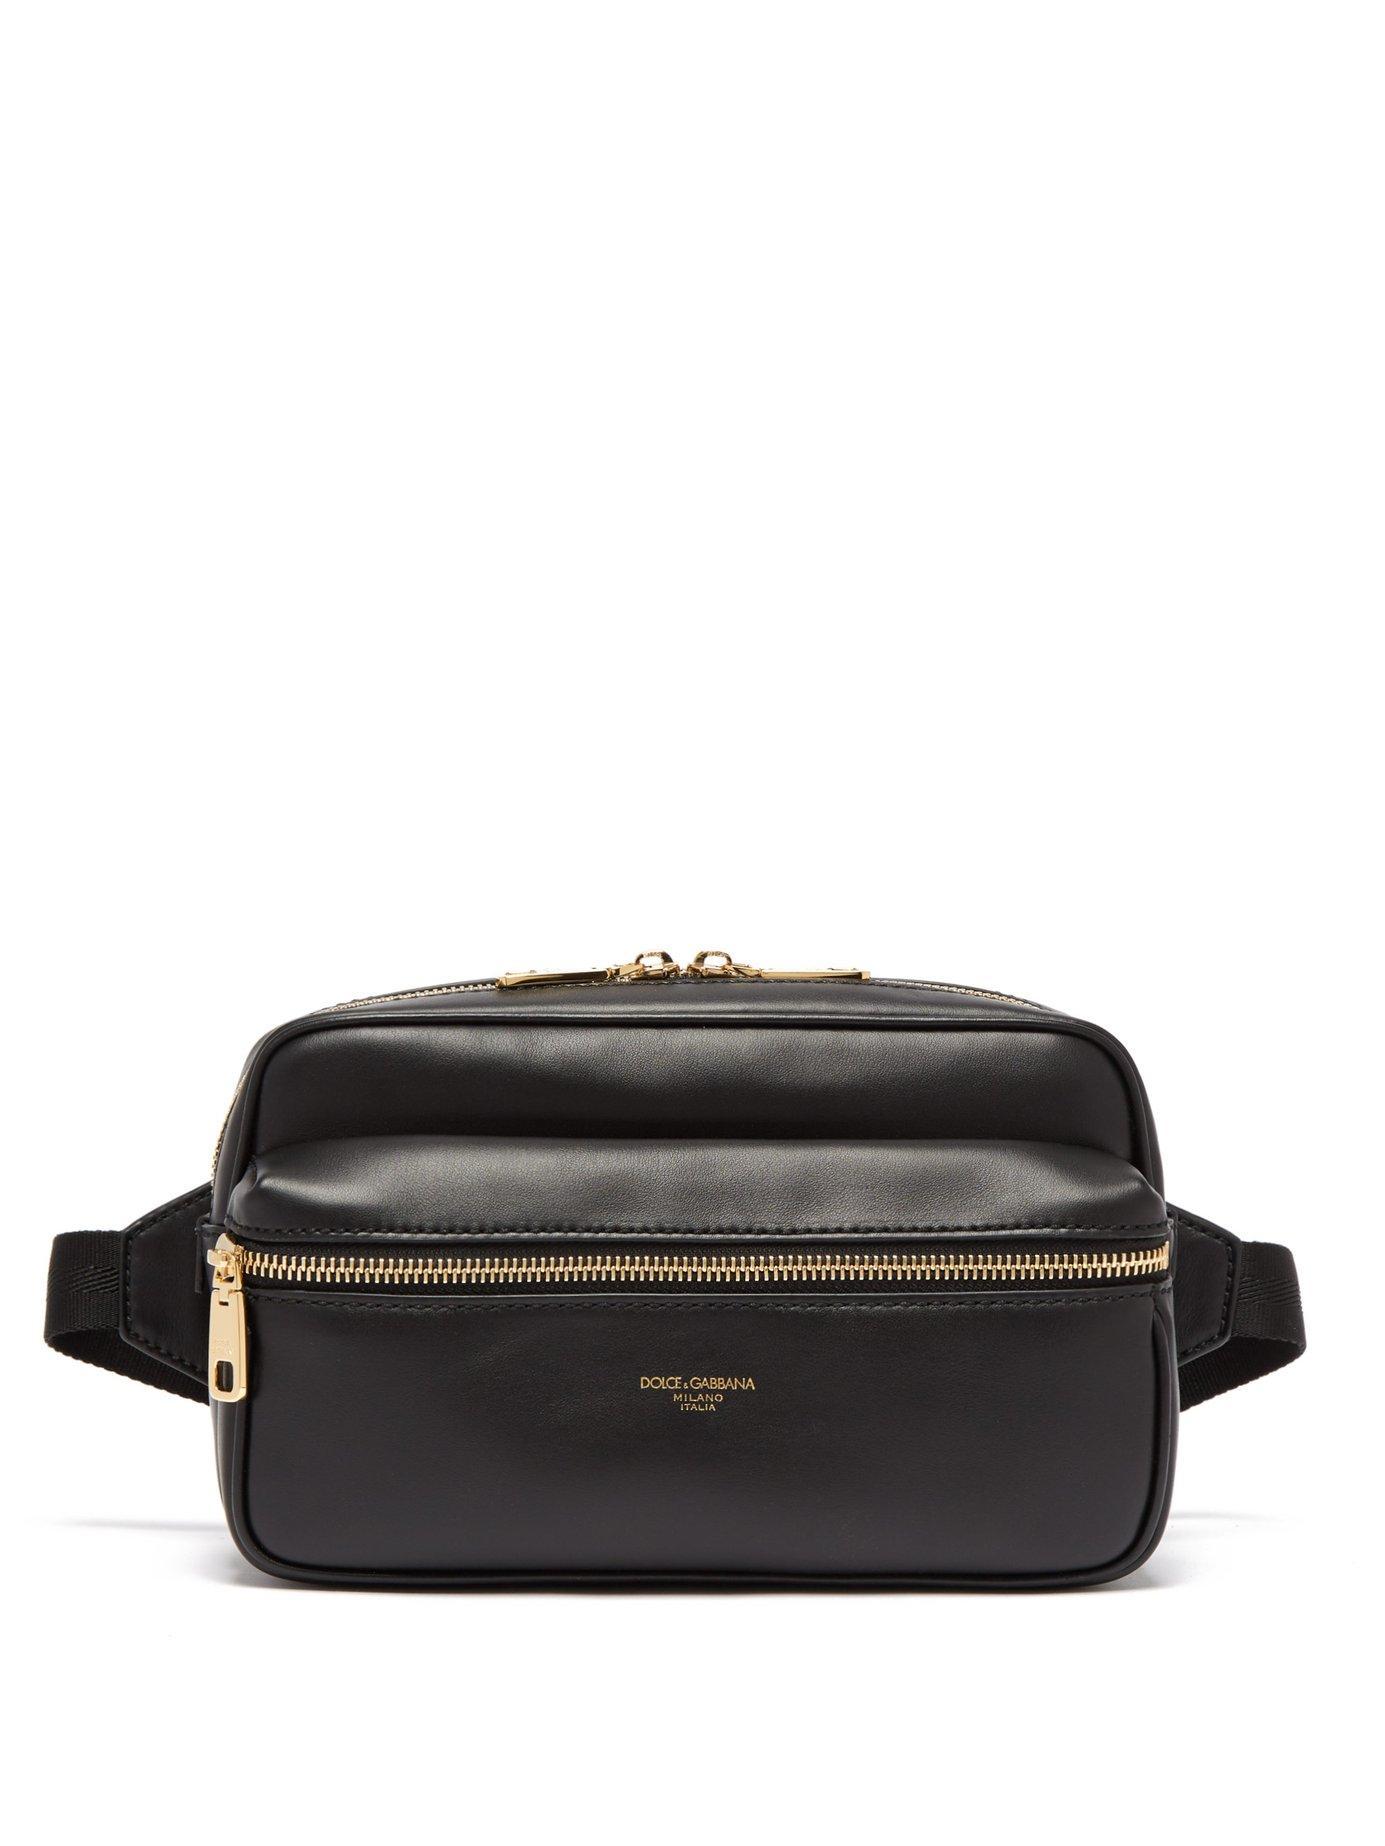 Lyst - Dolce   Gabbana Leather Cross Body Bag in Black for Men 5839512c10896